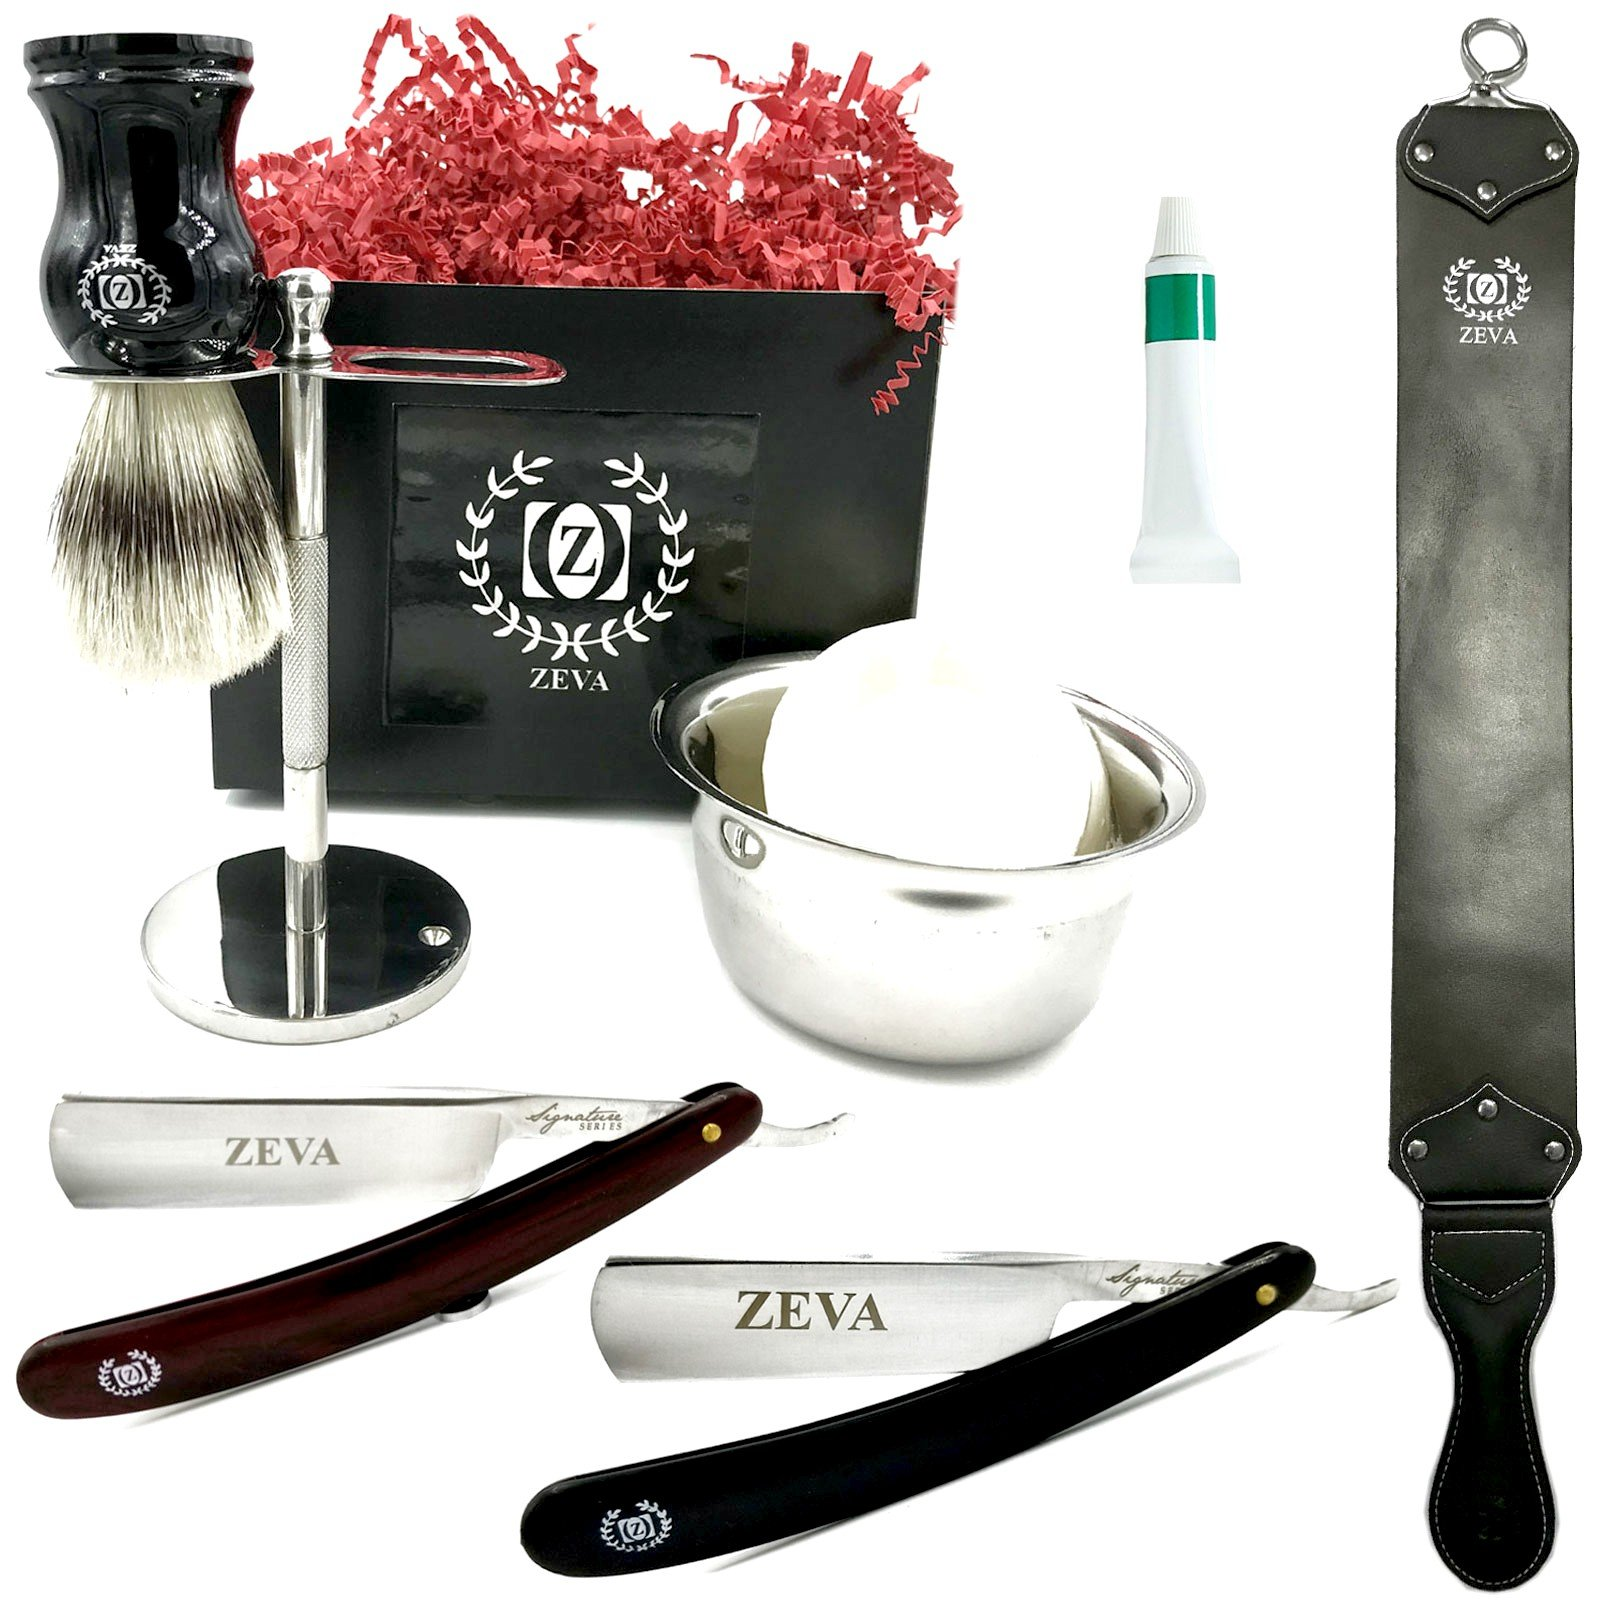 Straight Razor Cut Throat Shavette Mens Shaving Classic Shave Straight Razors Dovo Paste Strap Cup Soap Bag Shaving Set in Gift Box for XMAS